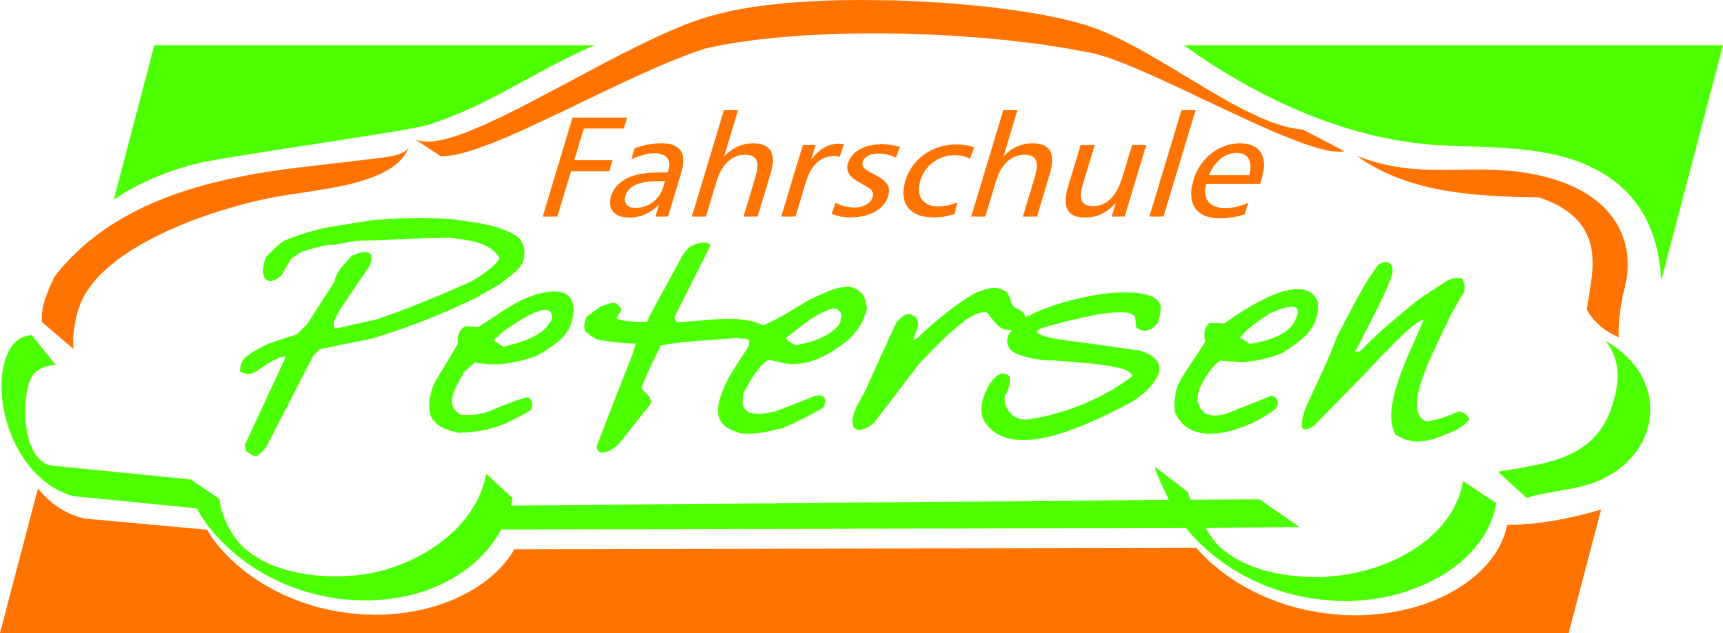 Fahrschule Markus Petersen